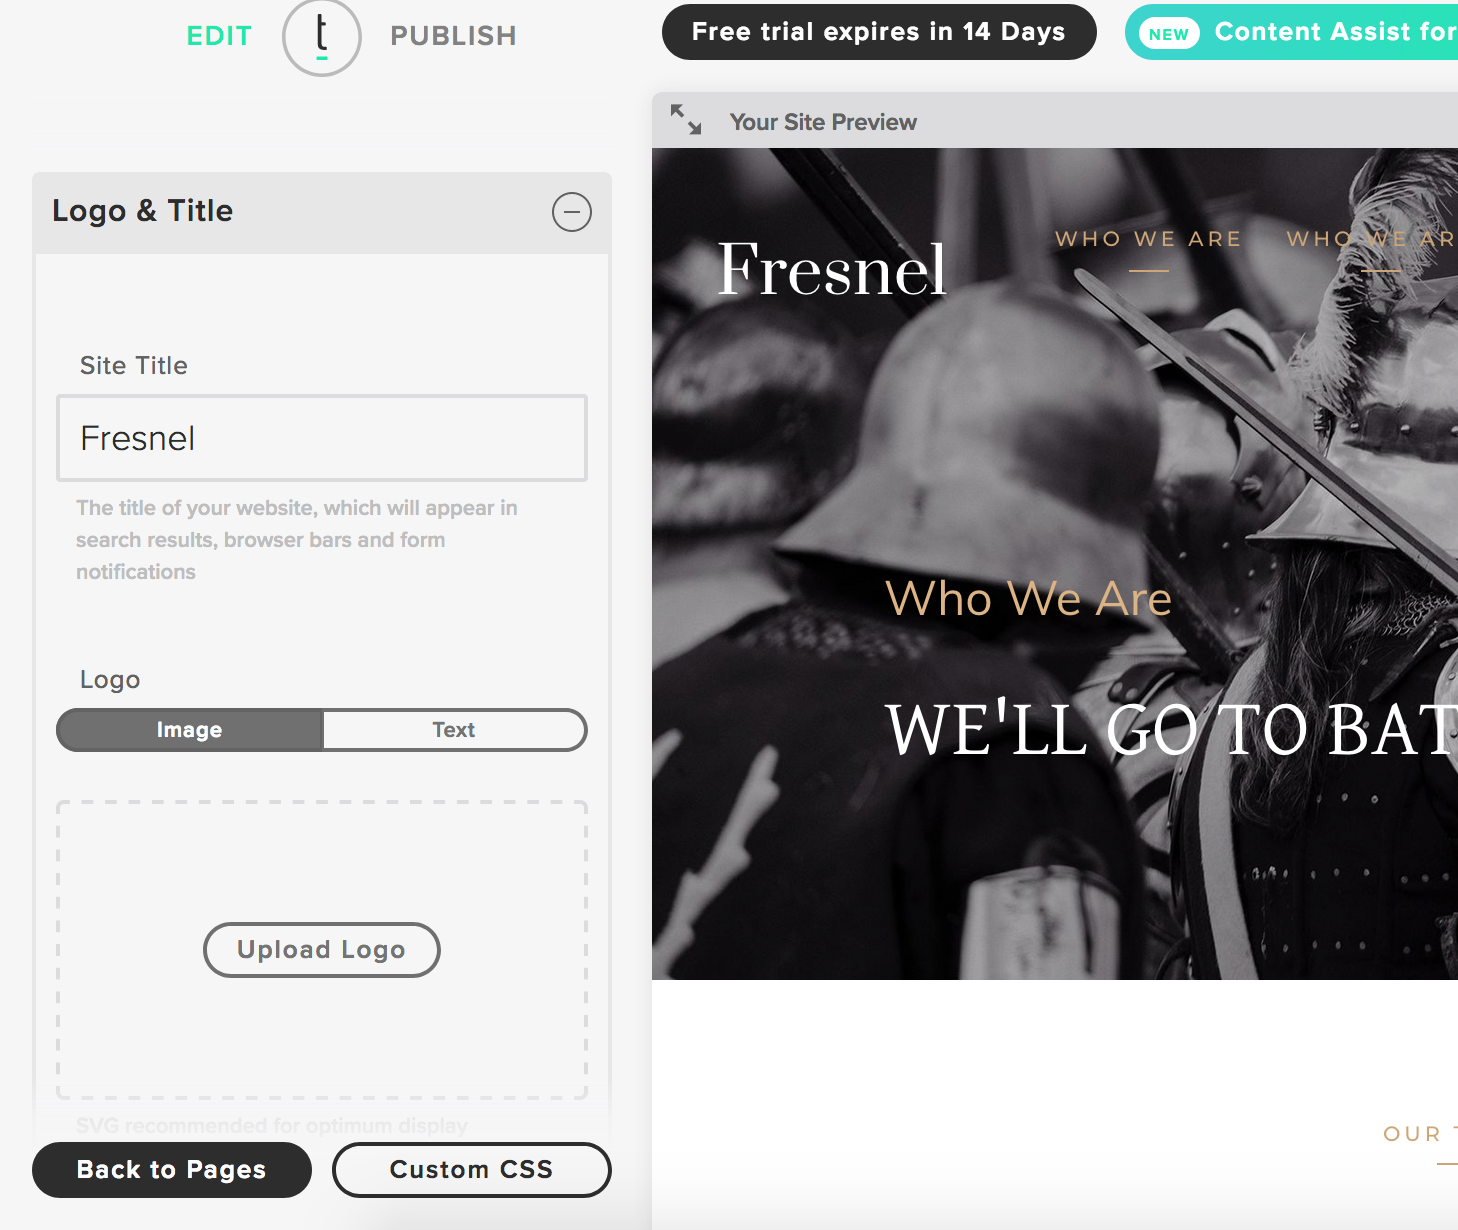 Adding a logo to your Twenty Over Ten website